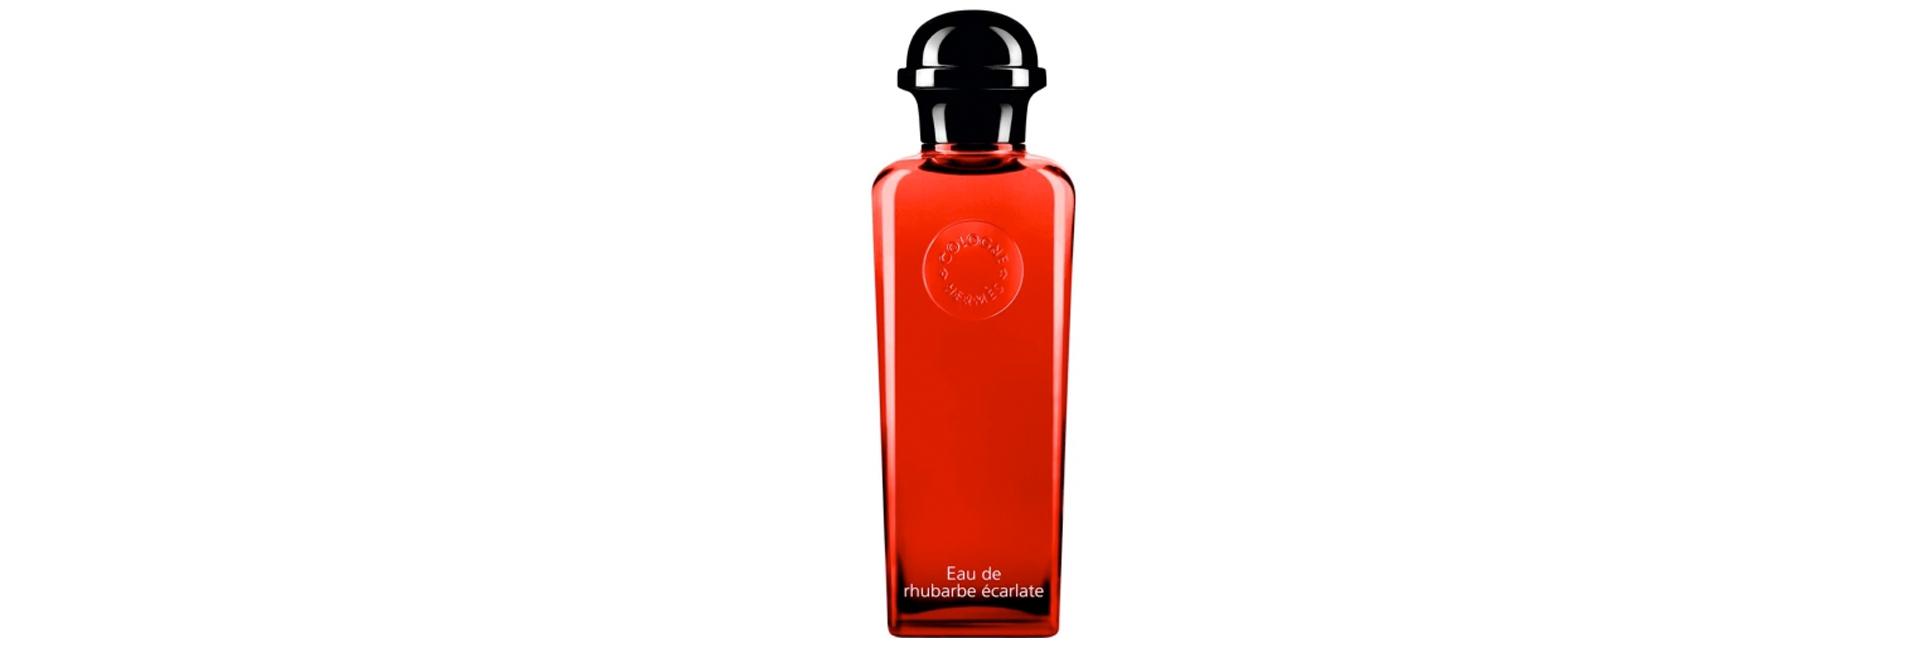 Eau Rhubarbe Ecarlate Hermes Blog Beaute Soin Parfum Homme The New